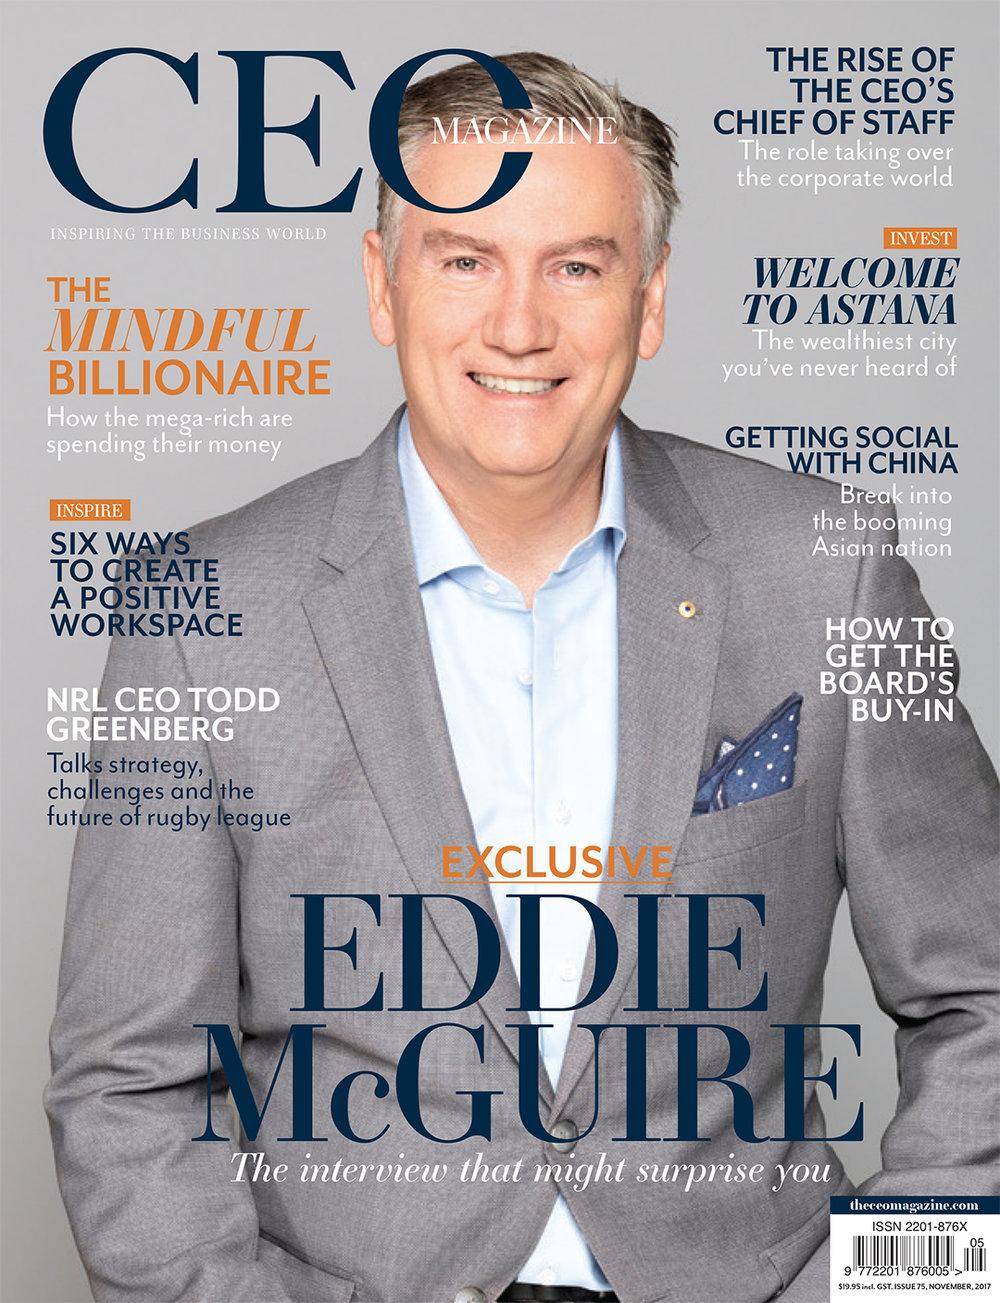 CEO cover.jpg